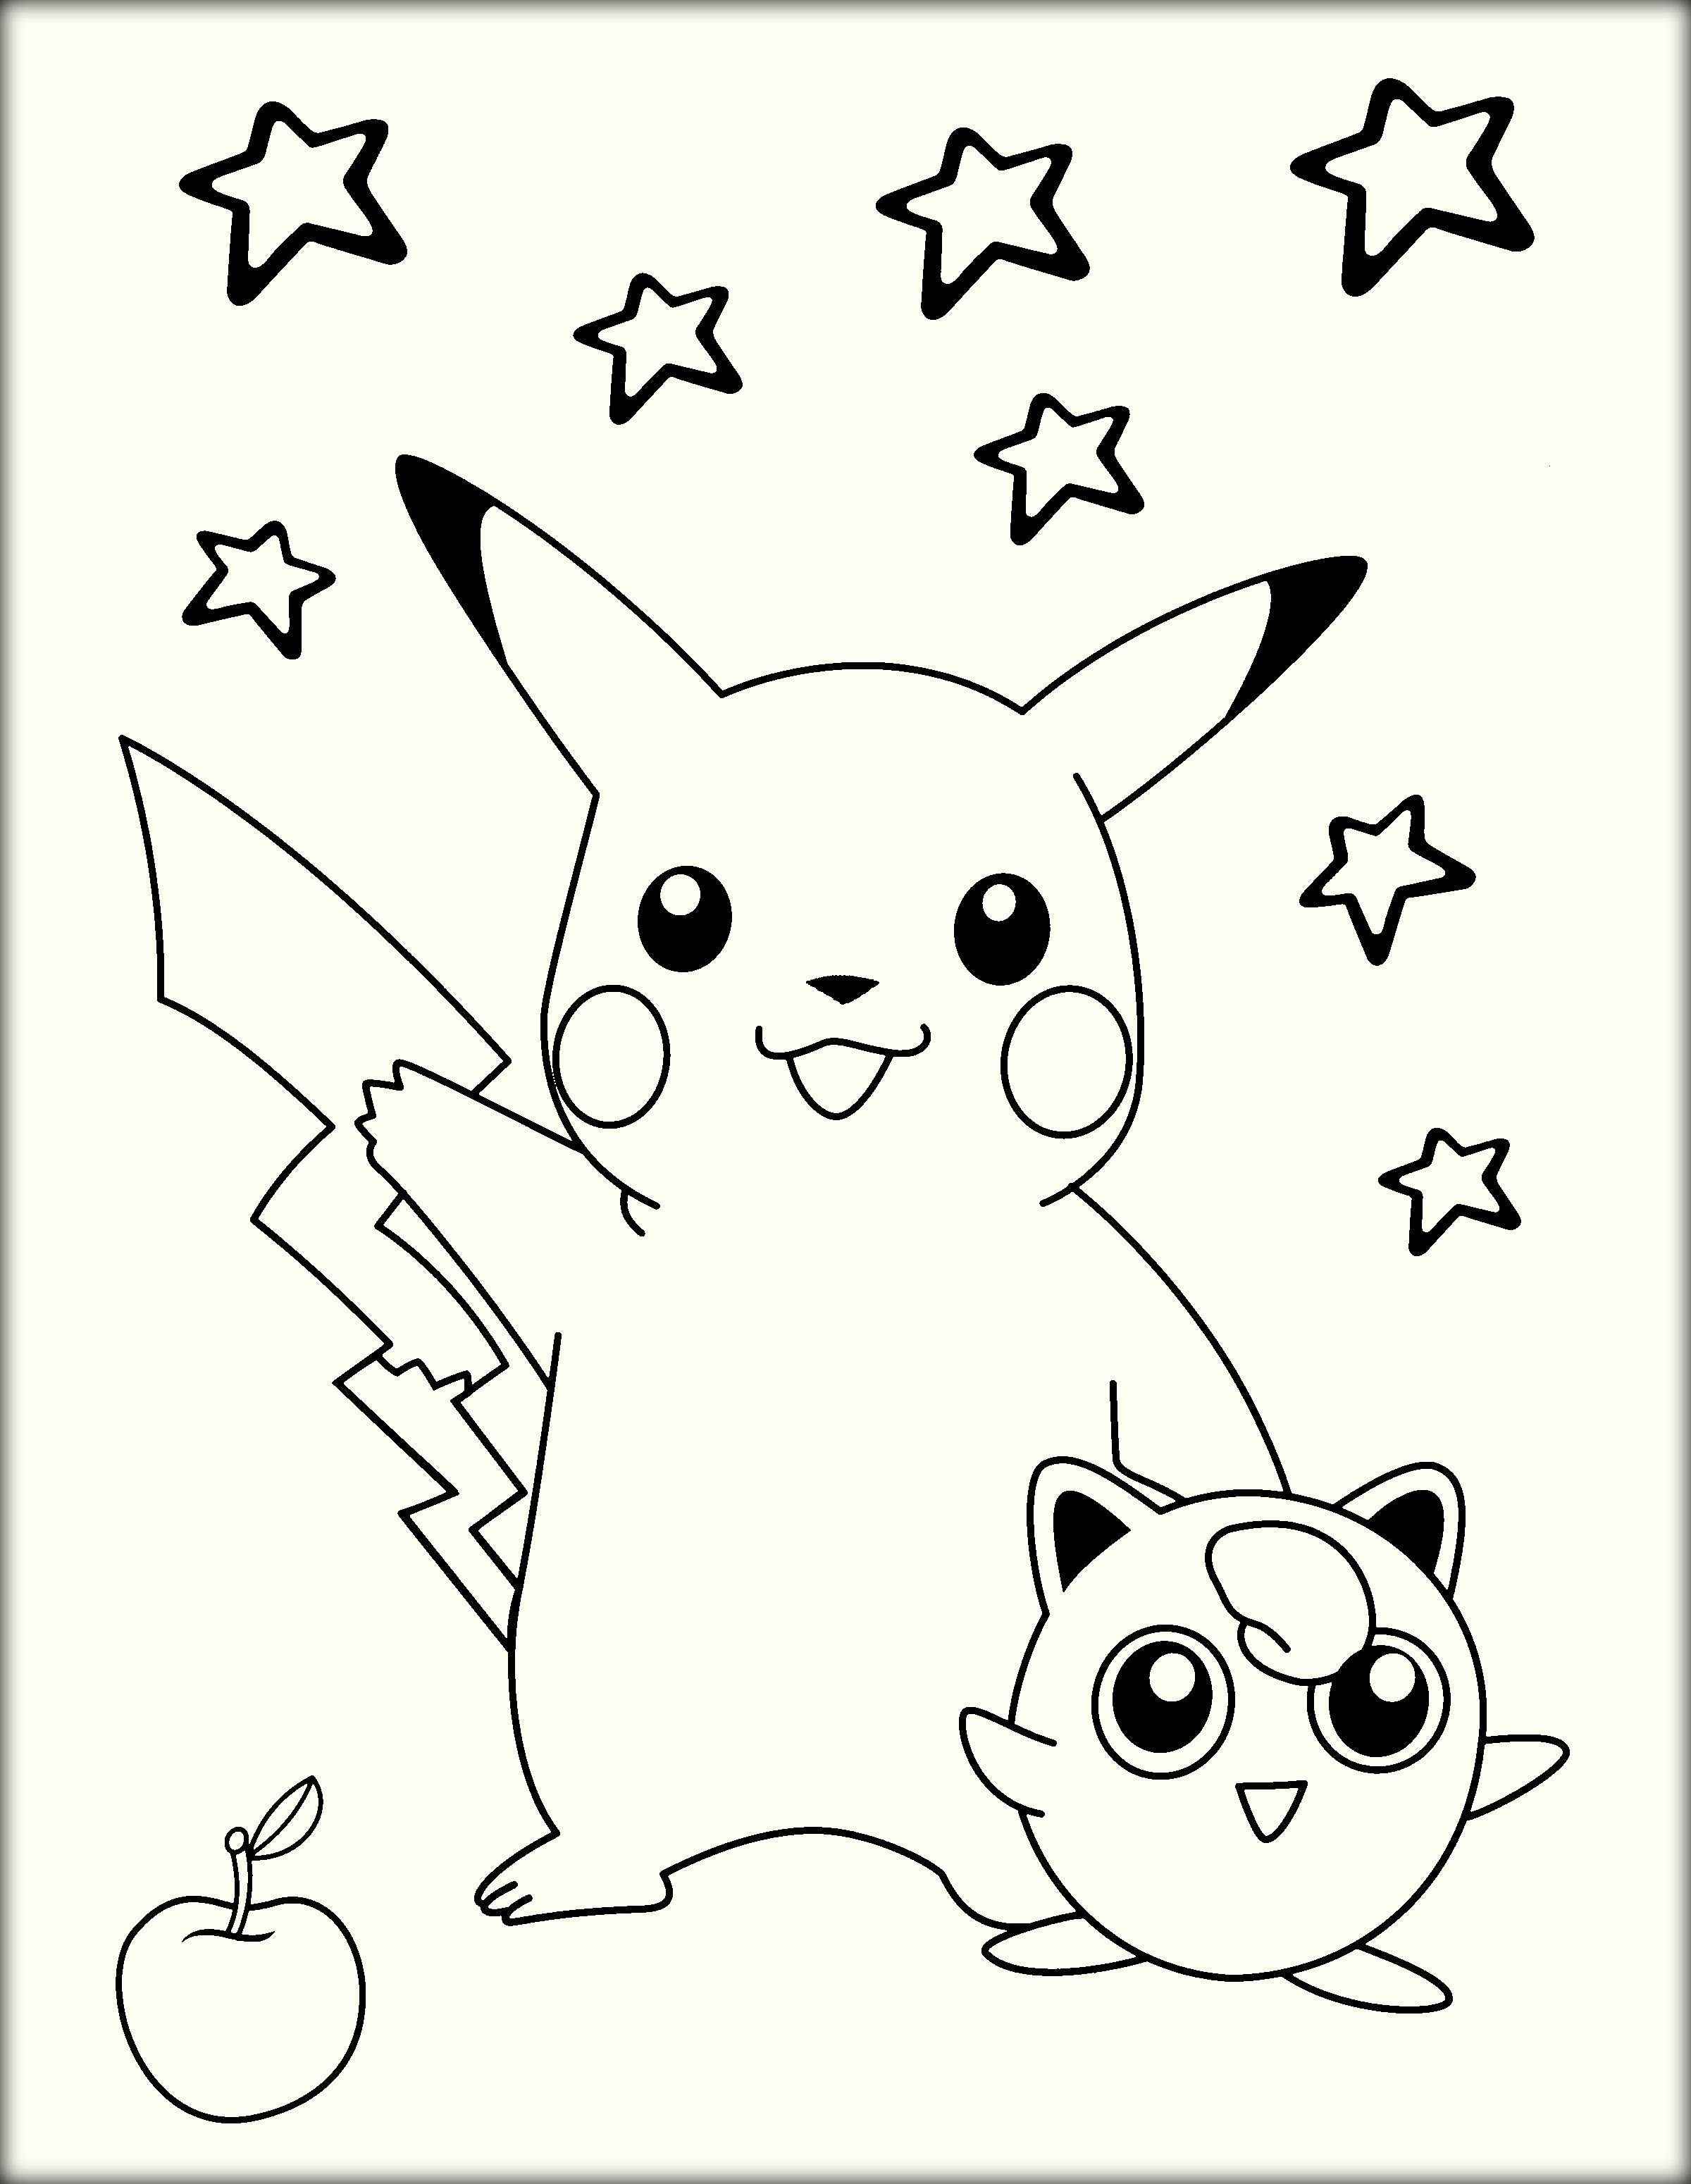 Free Printable Drawing For Kids At Getdrawings